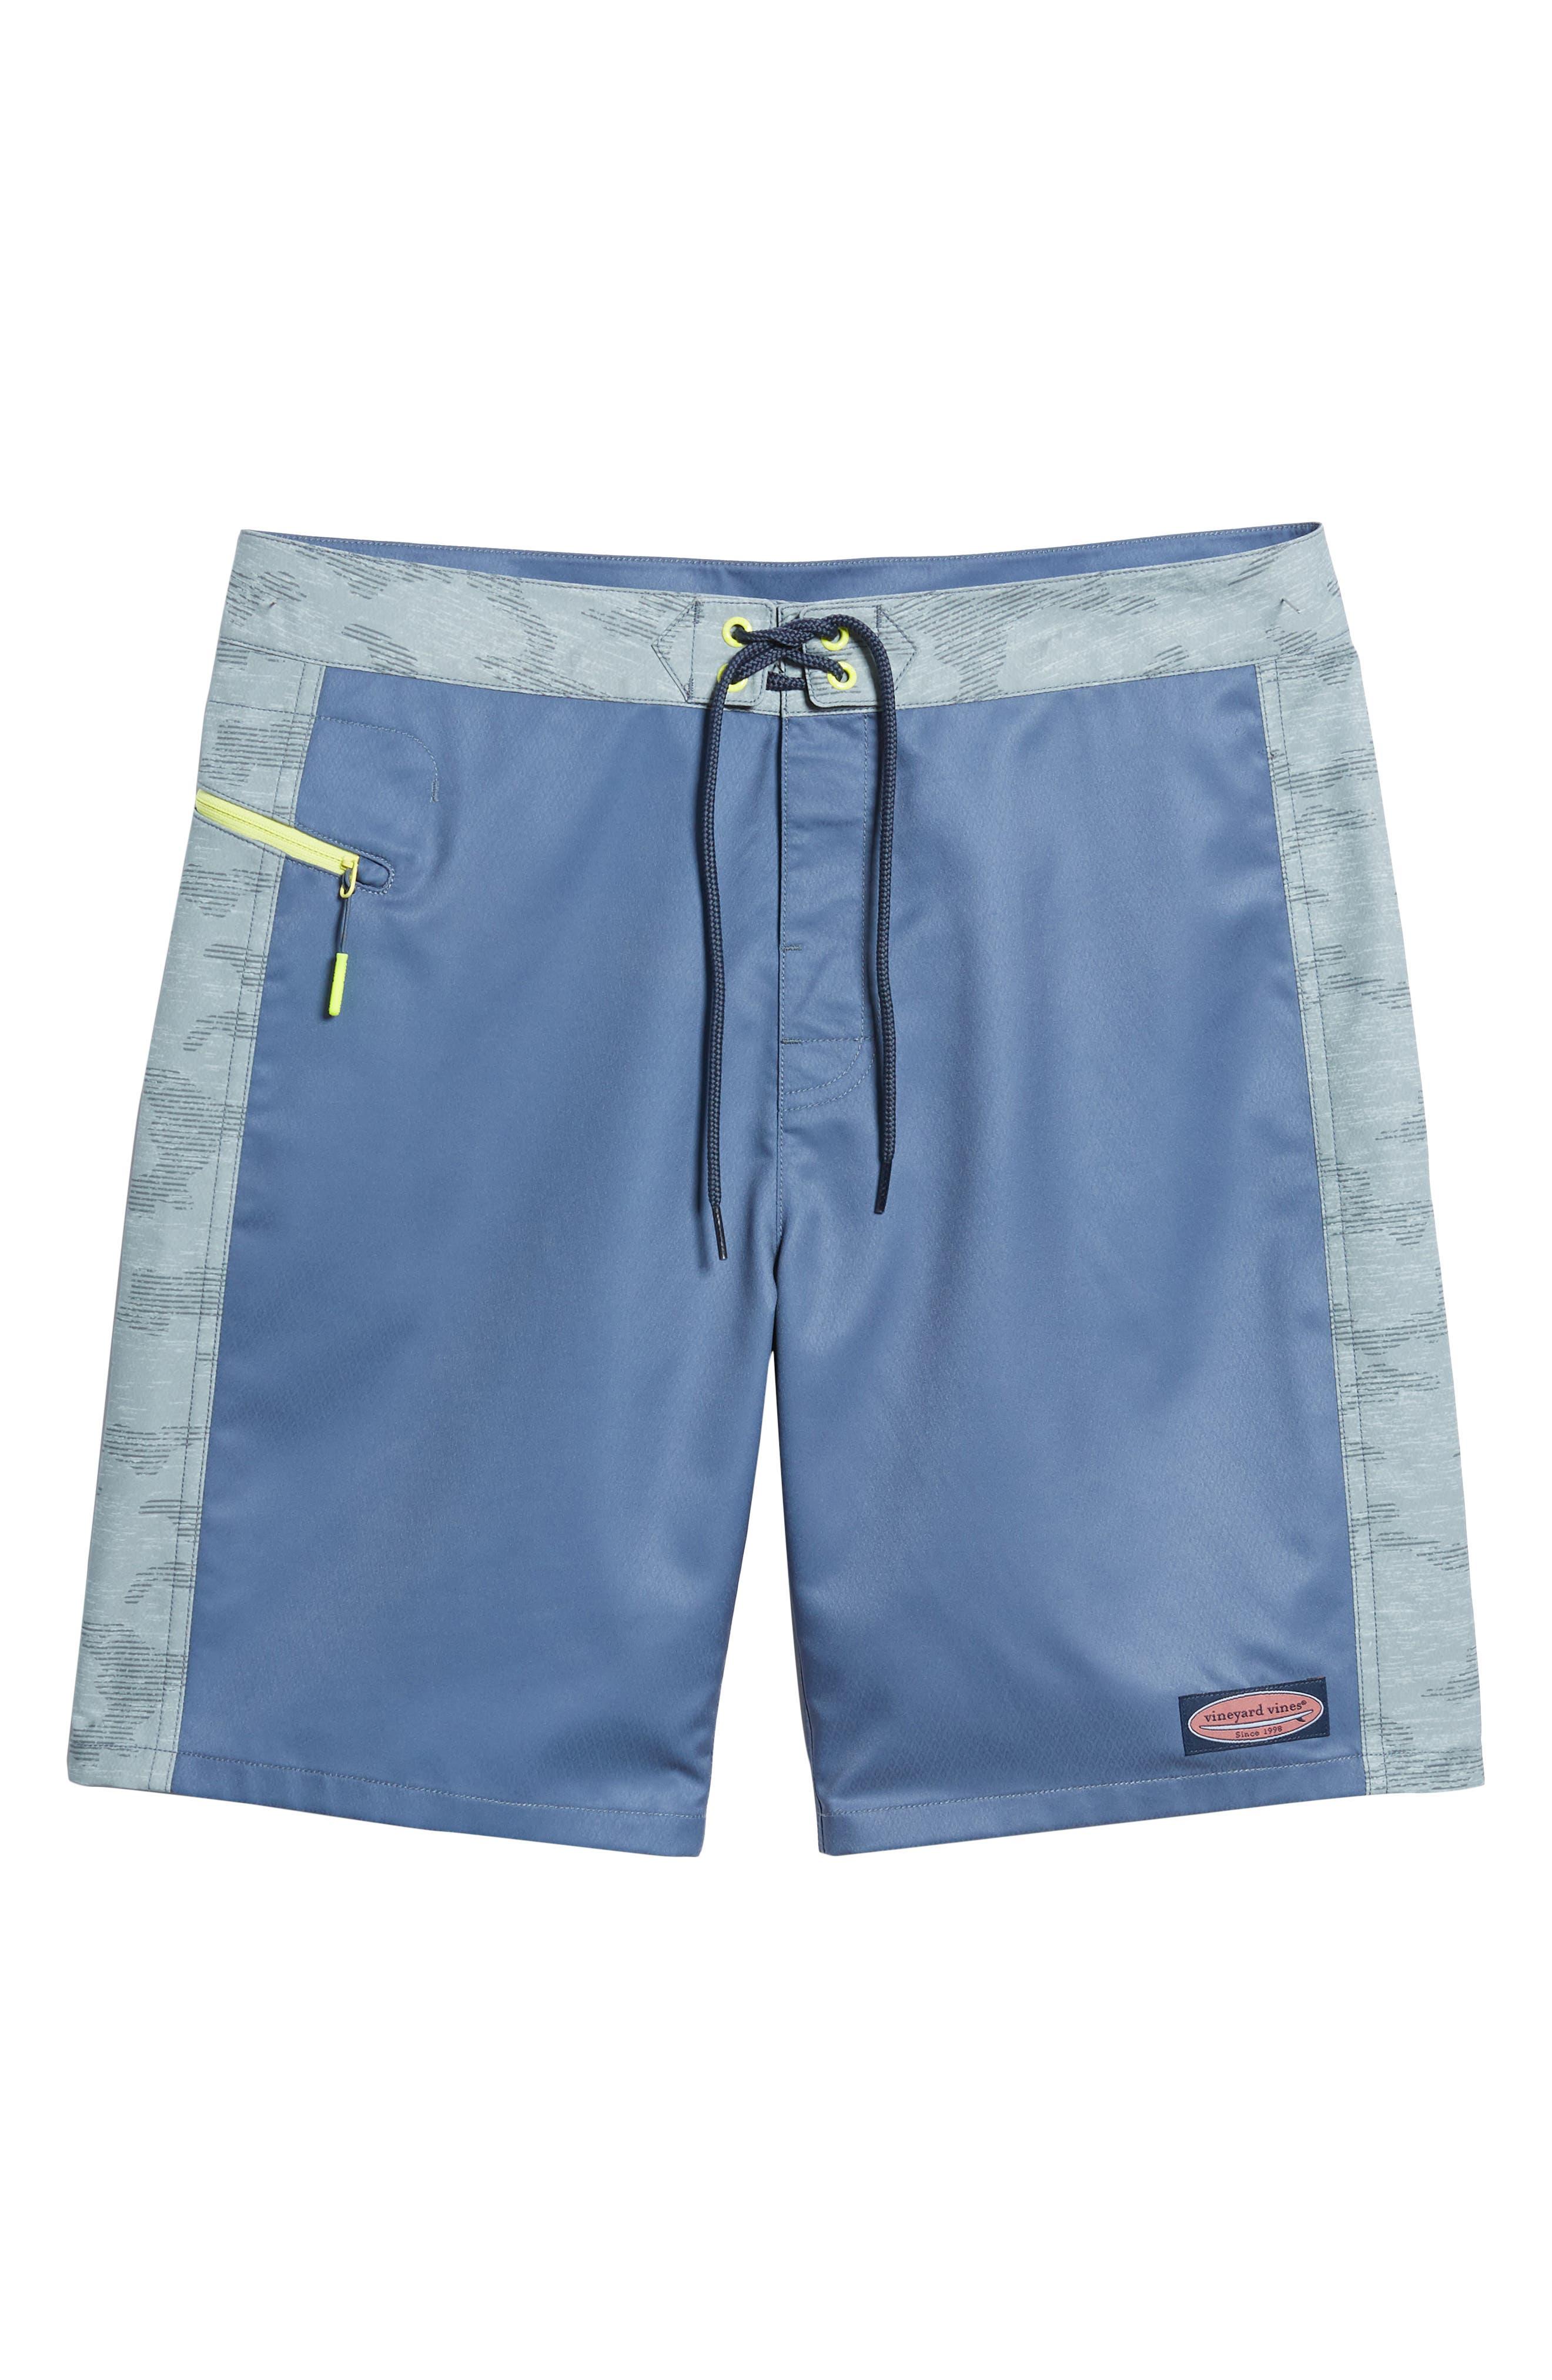 Camo Board Shorts,                             Alternate thumbnail 6, color,                             068